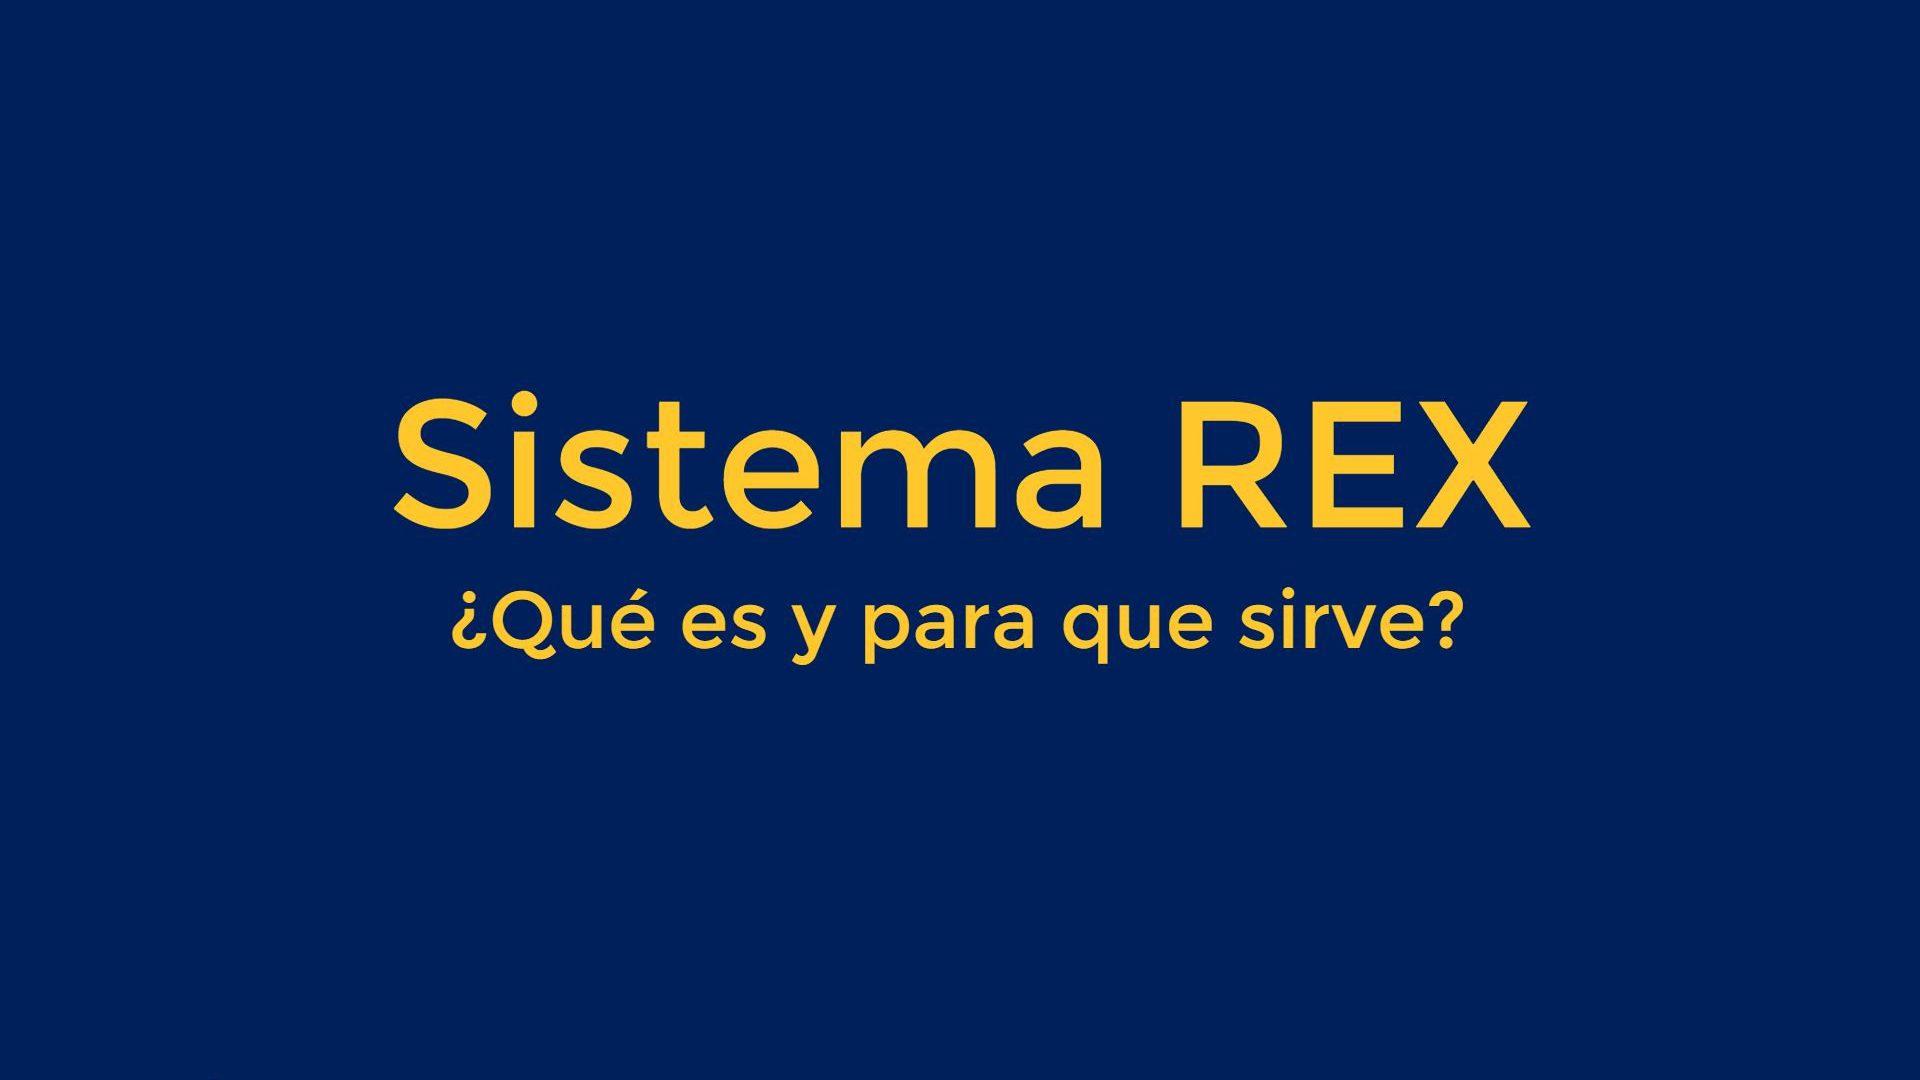 Sistema Rex